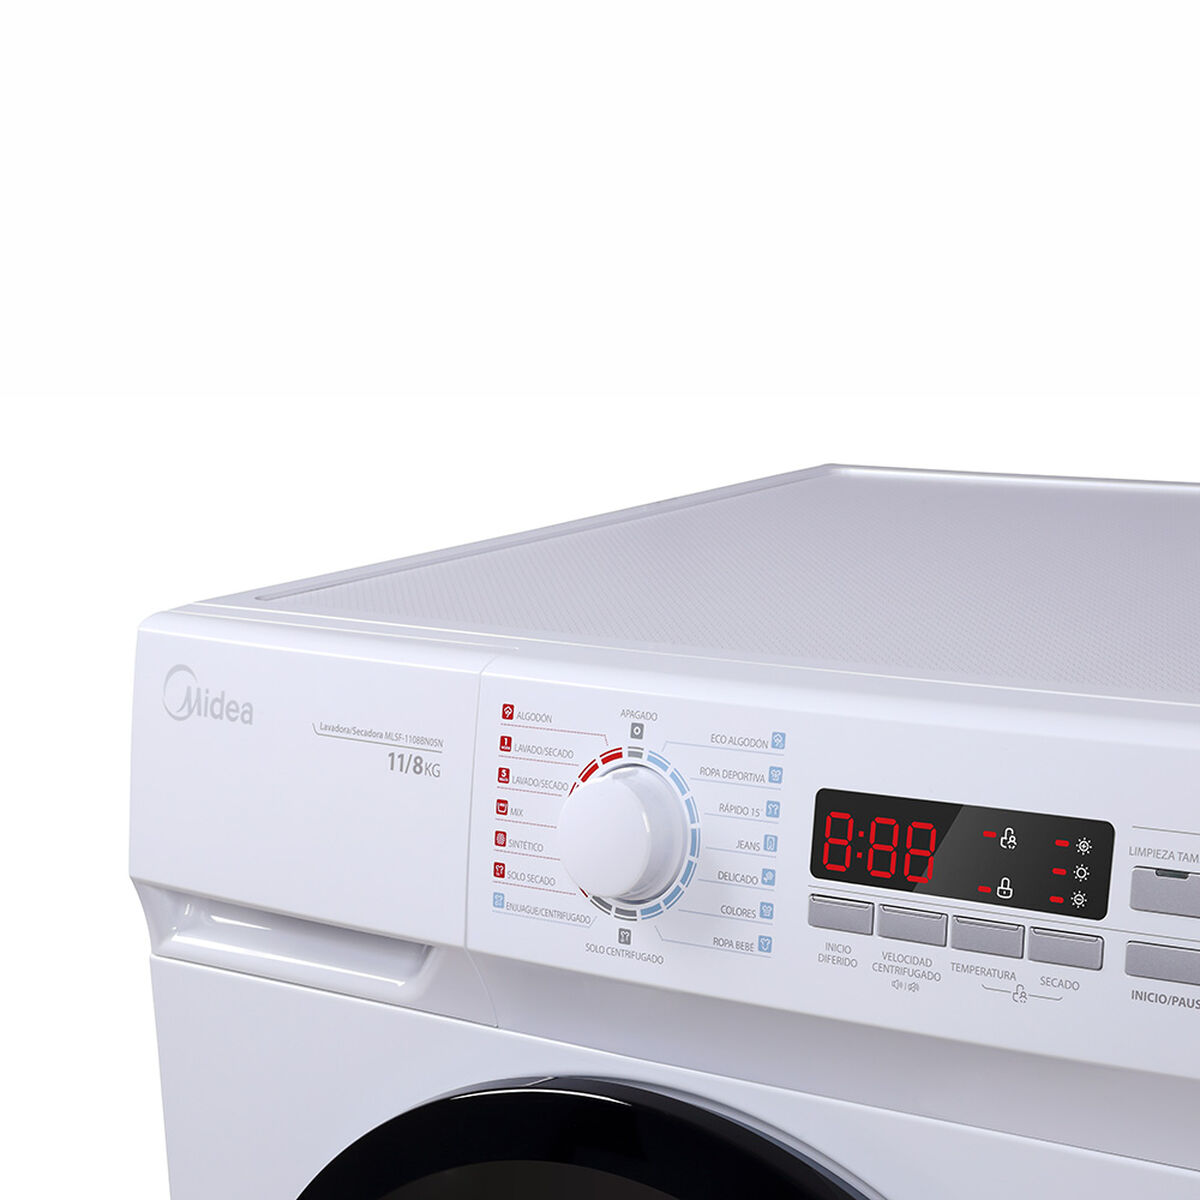 Lavadora Secadora Midea MLSF-1108BN05N 11/8 kg.